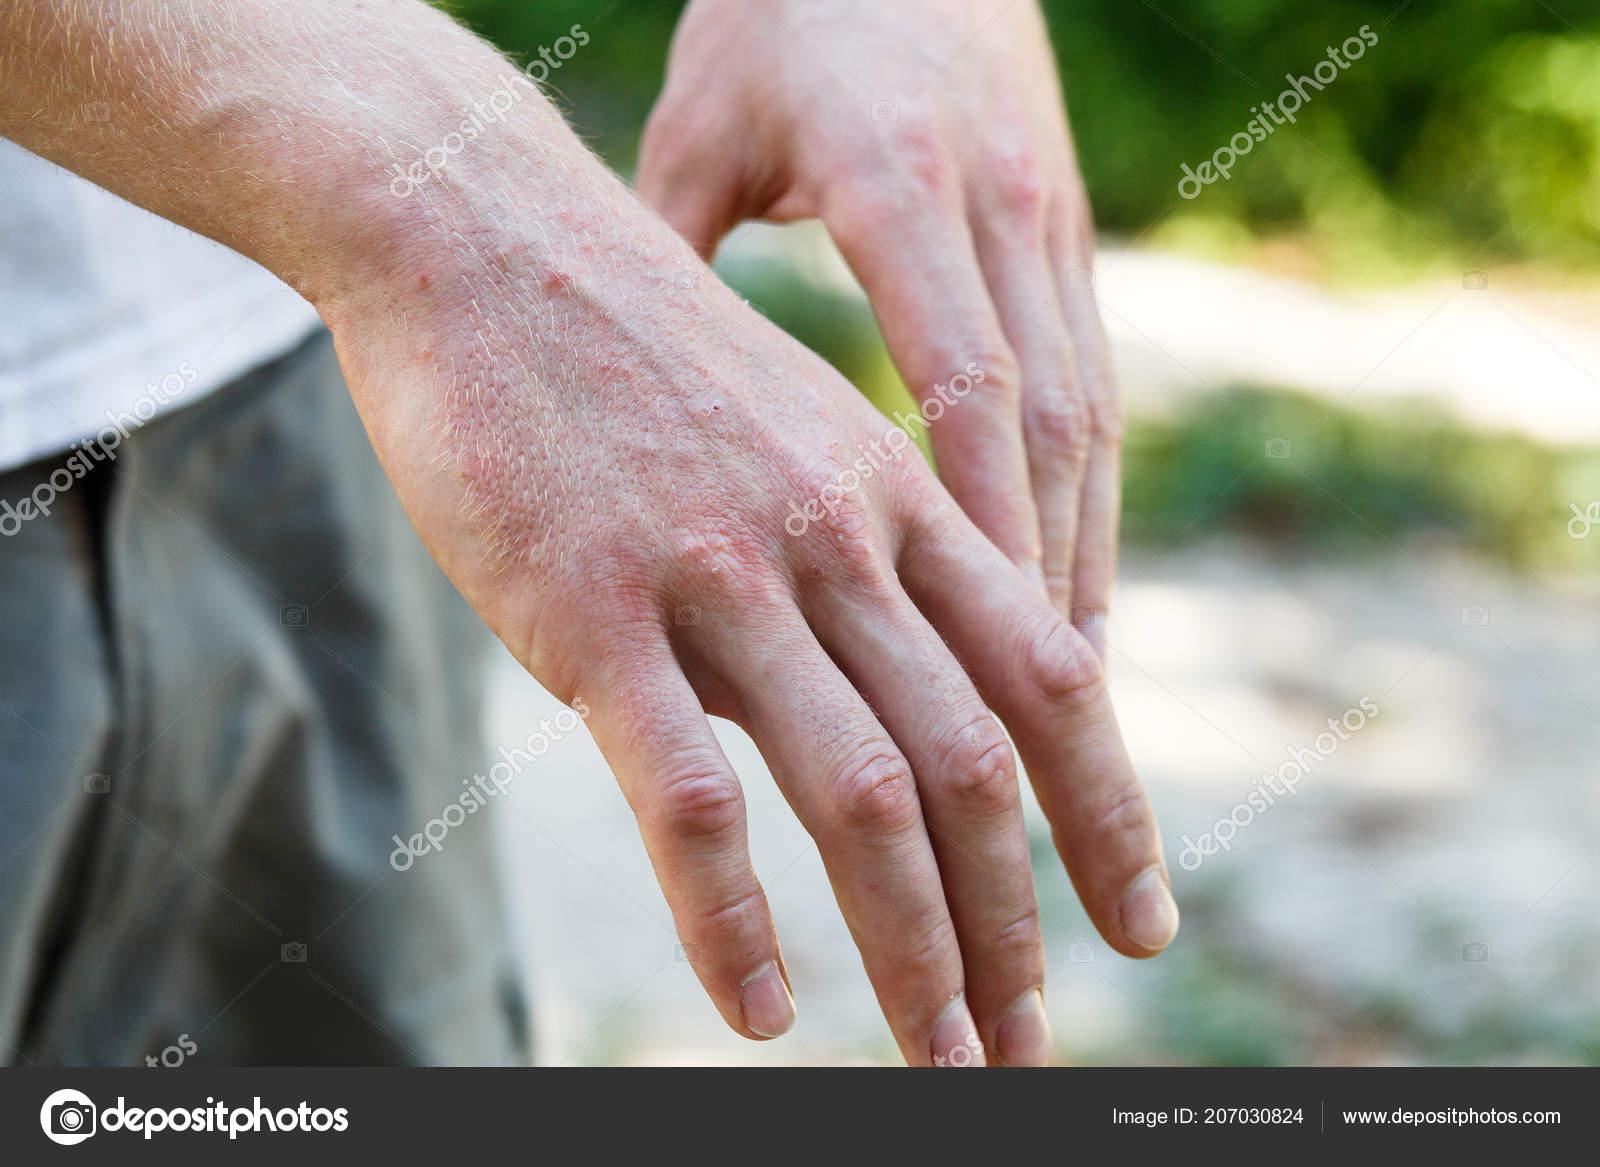 plakkos psoriasis fotók s kezels